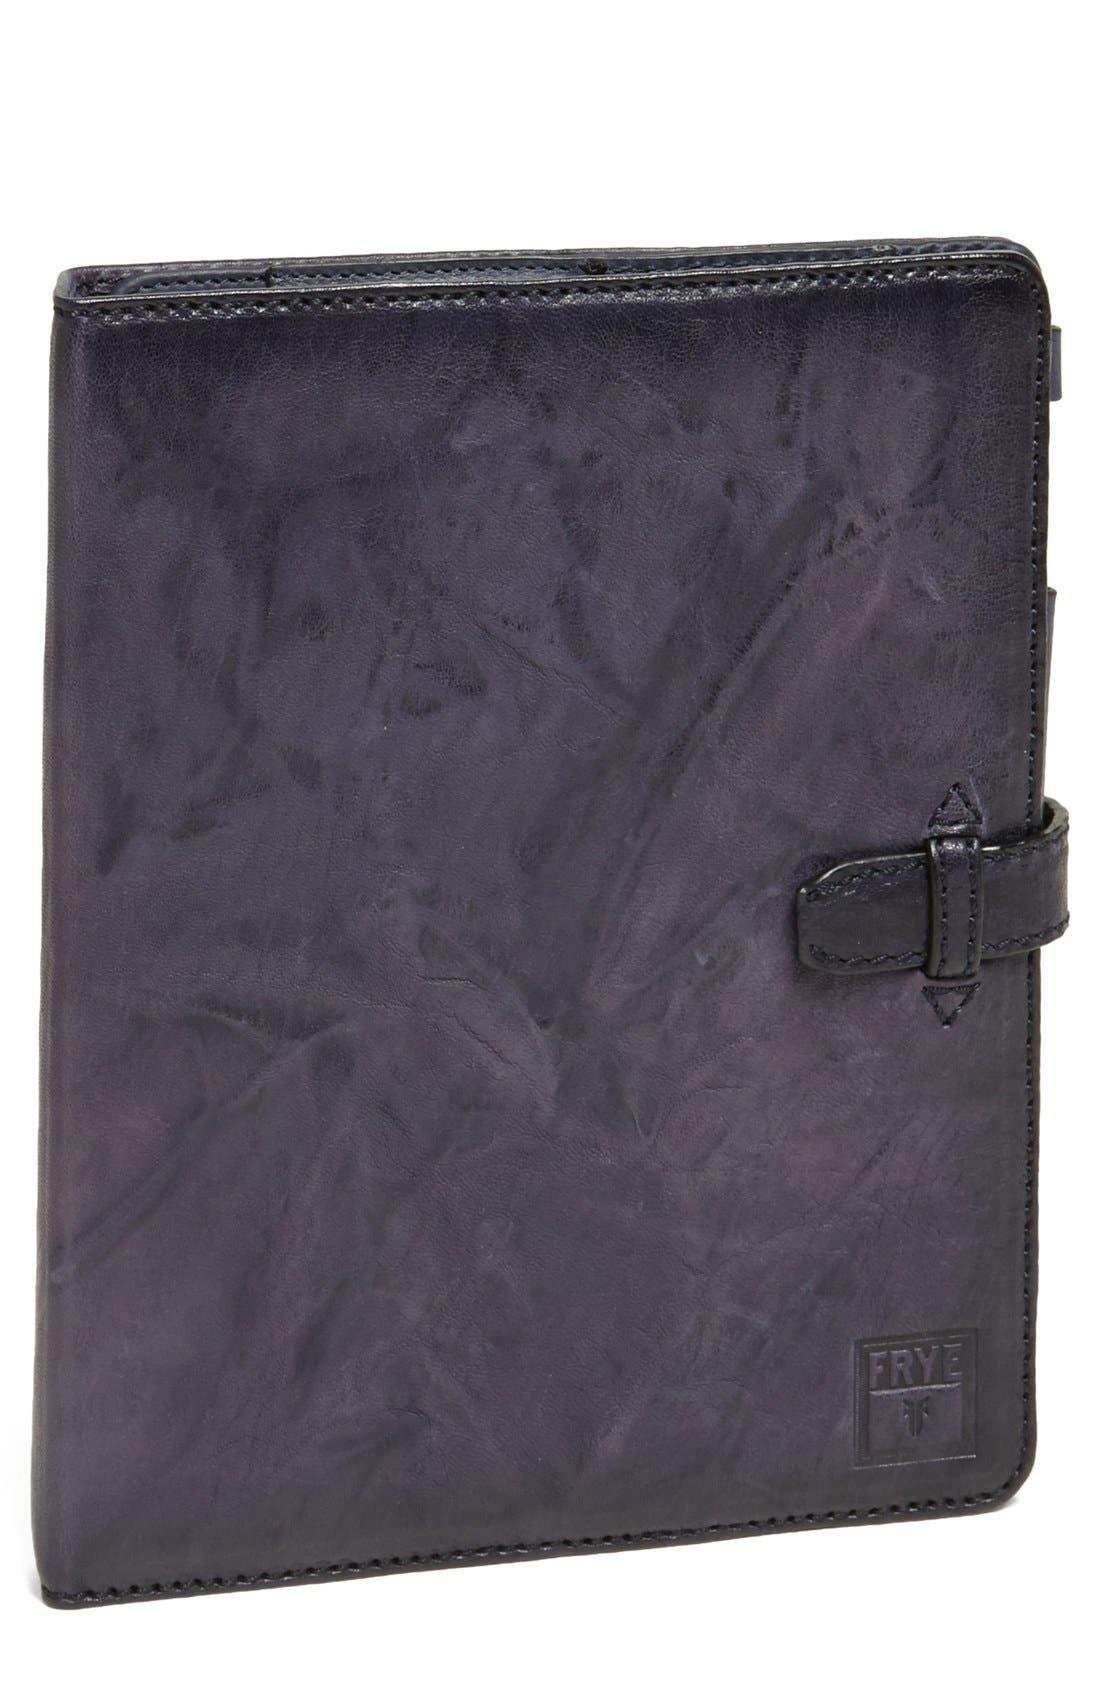 Alternate Image 1 Selected - Frye 'Cameron' iPad 2 & 3 Case